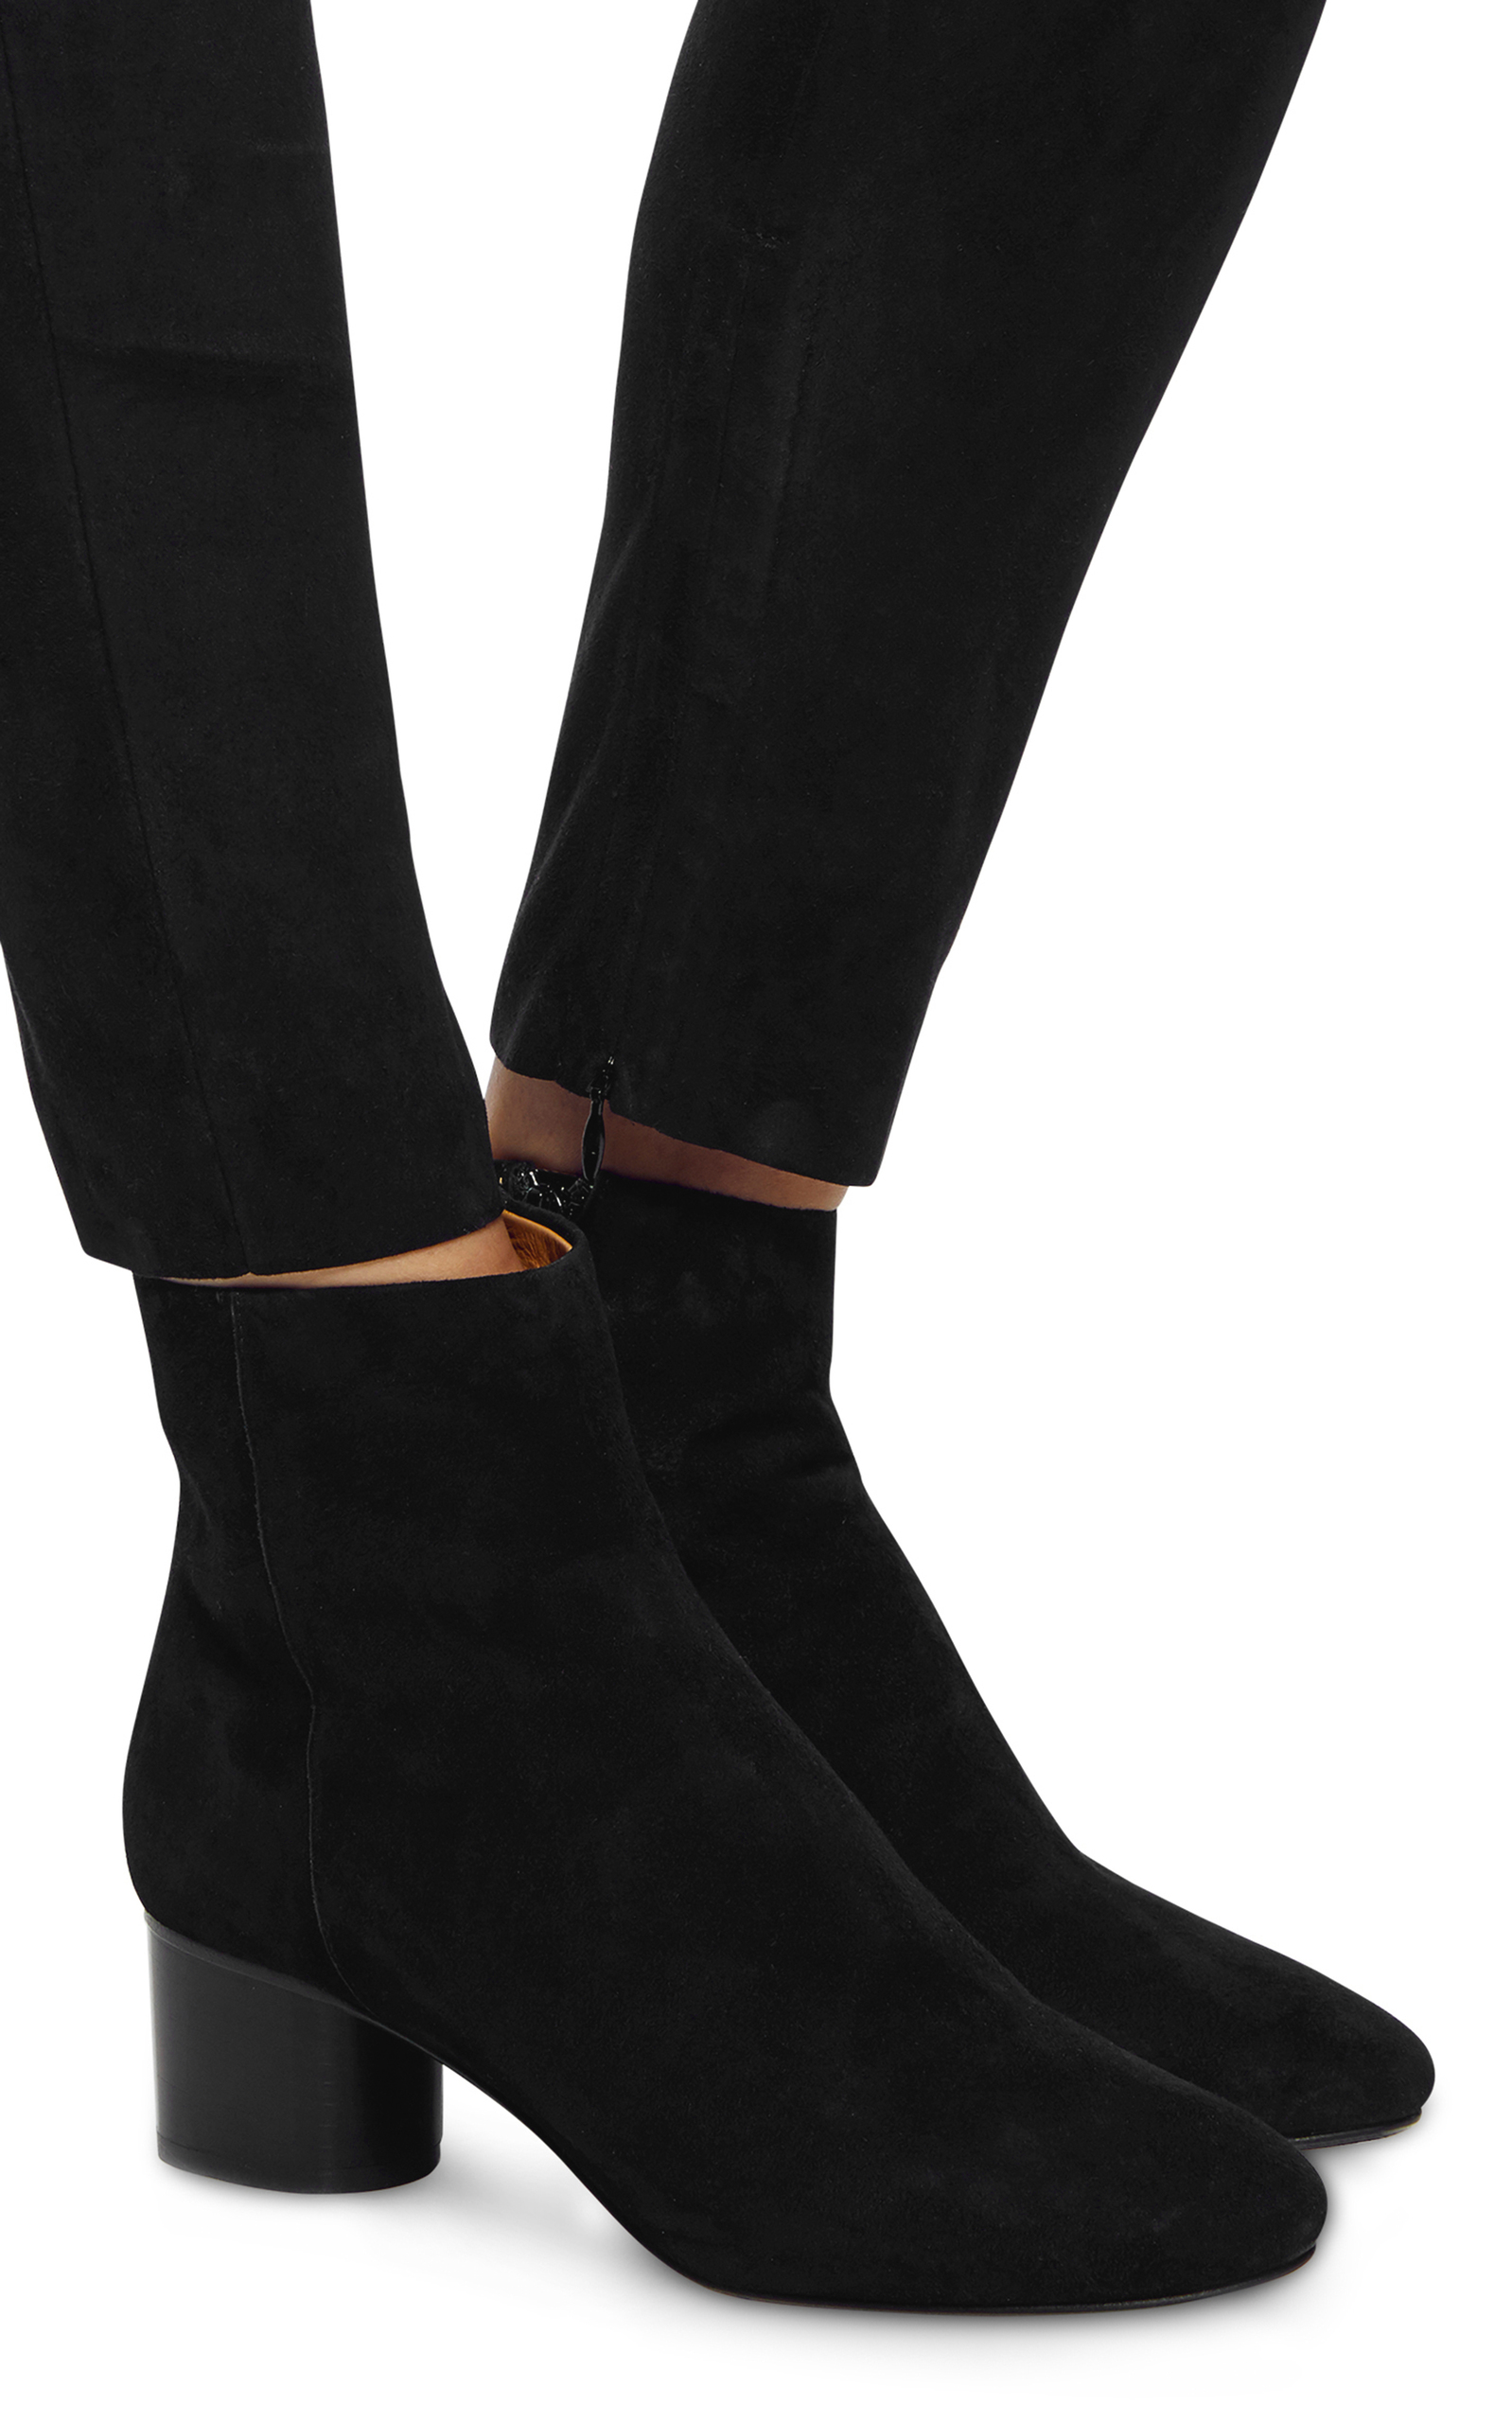 Black Suede Danay Boots Isabel Marant gSJVHFVi8q